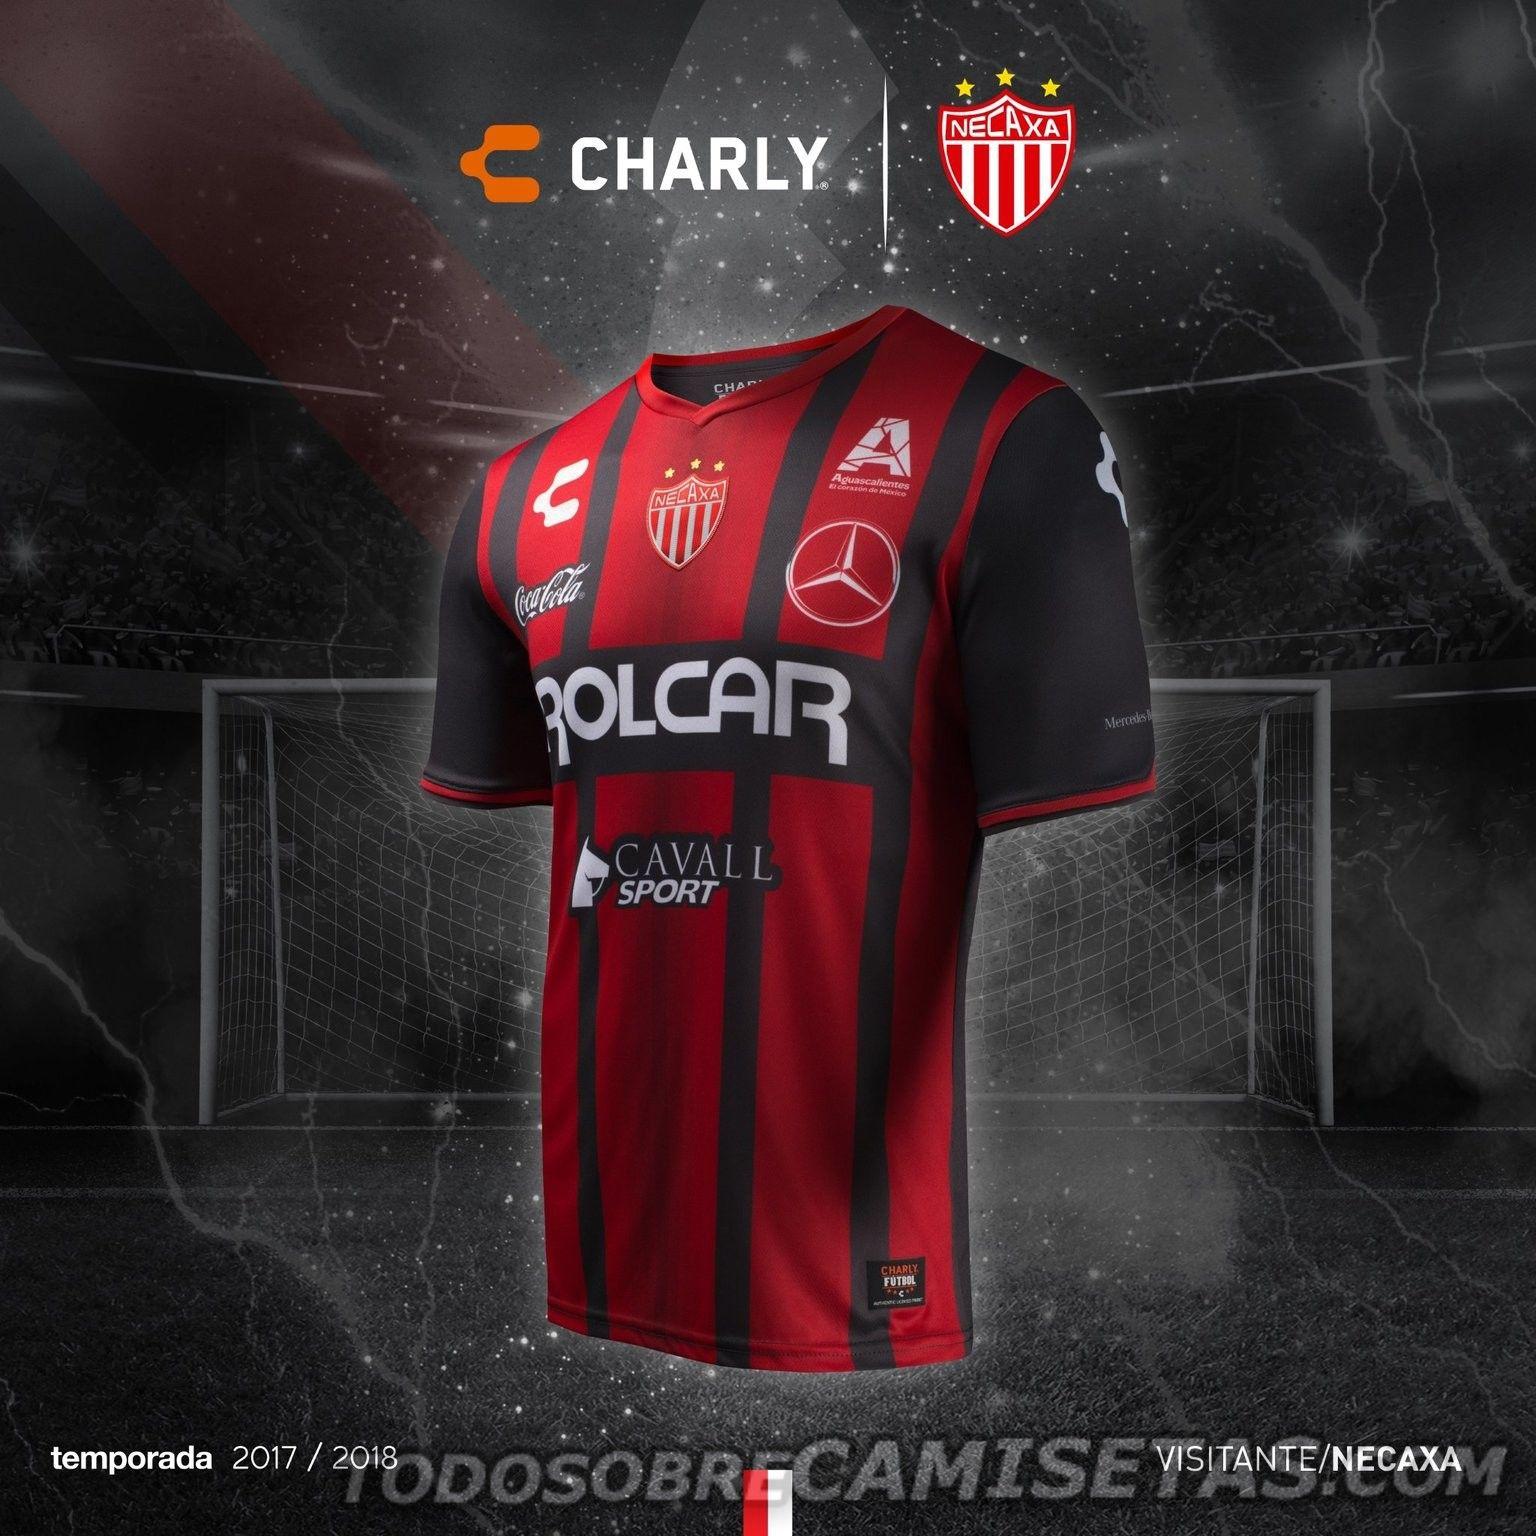 Uniformes Charly Futbol de Necaxa 2017 - Todo Sobre Camisetas ... 05d9ba343086c